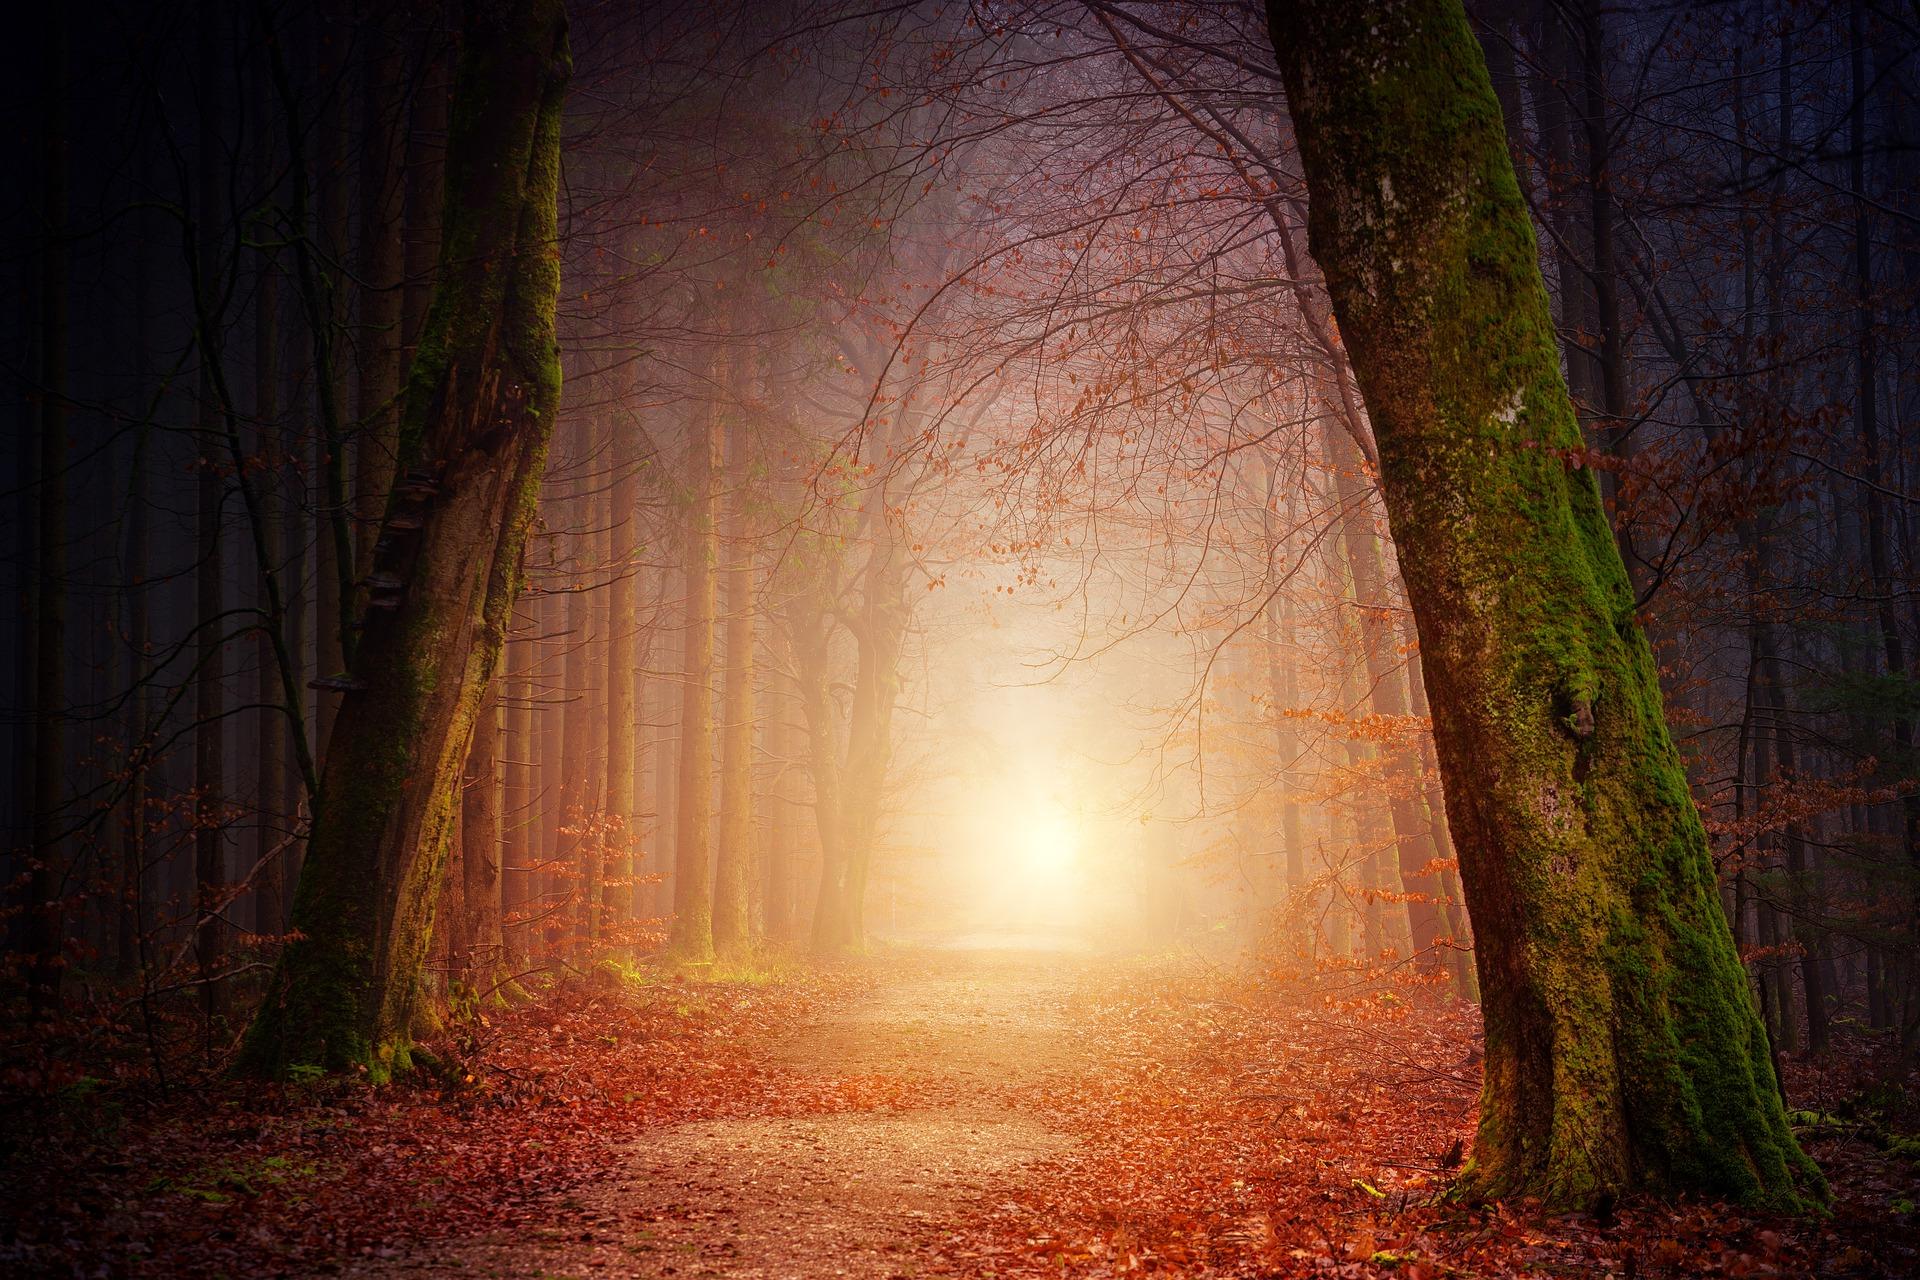 Forest, written by Catherine Fasoro